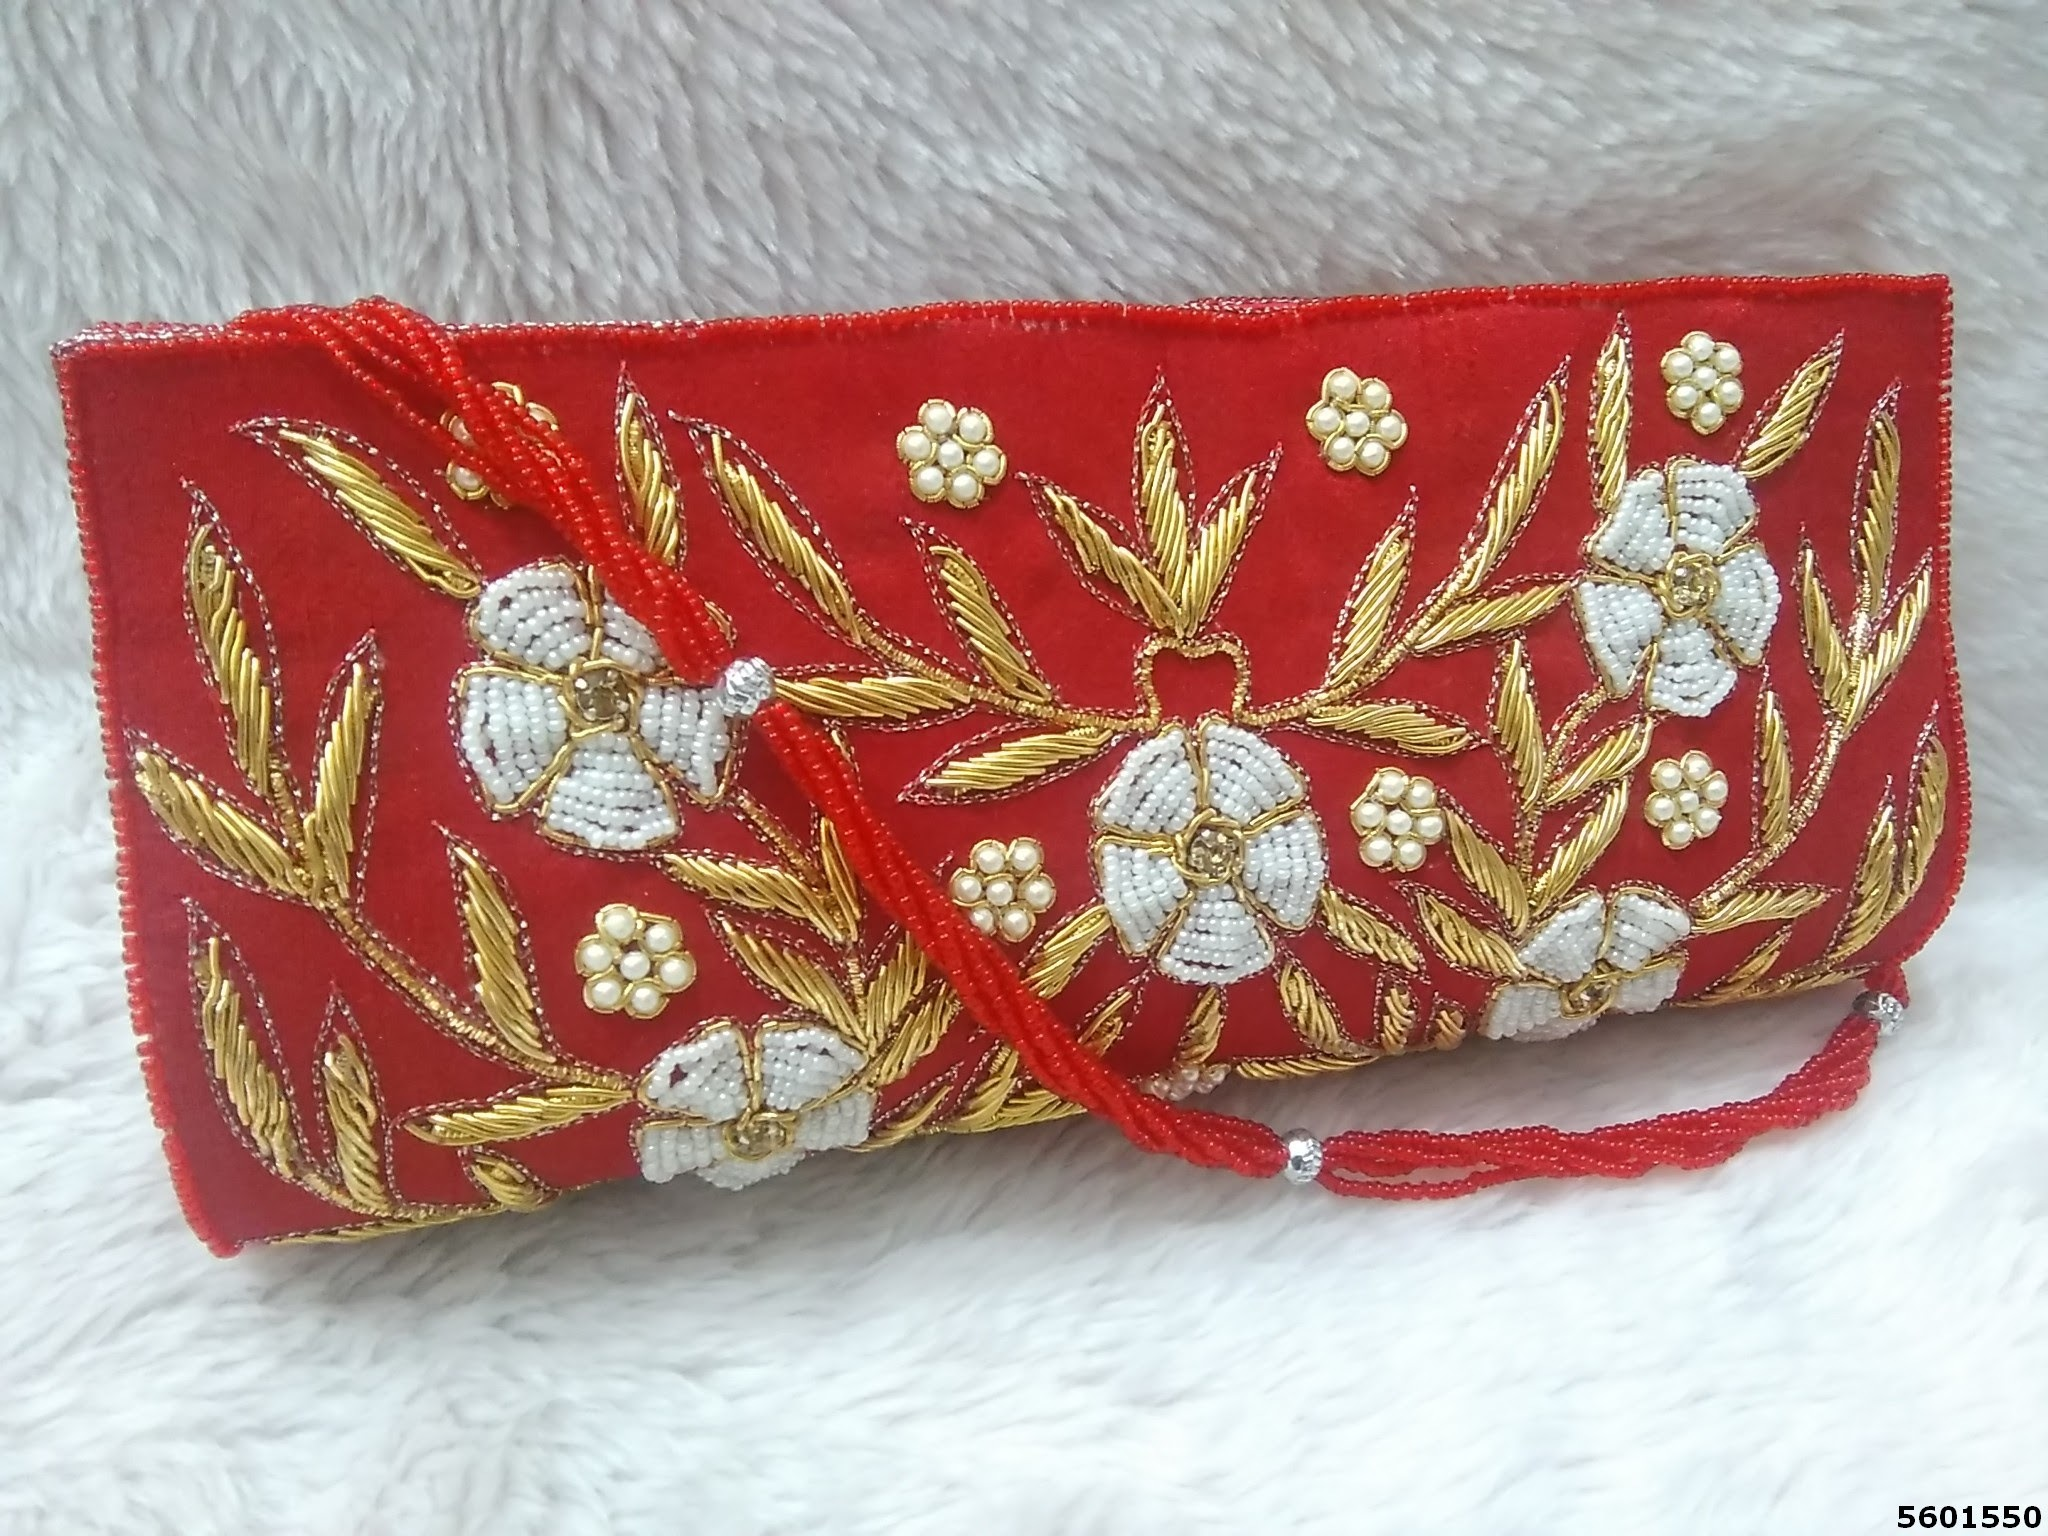 New Elegant partywear Evening Clutch Bag